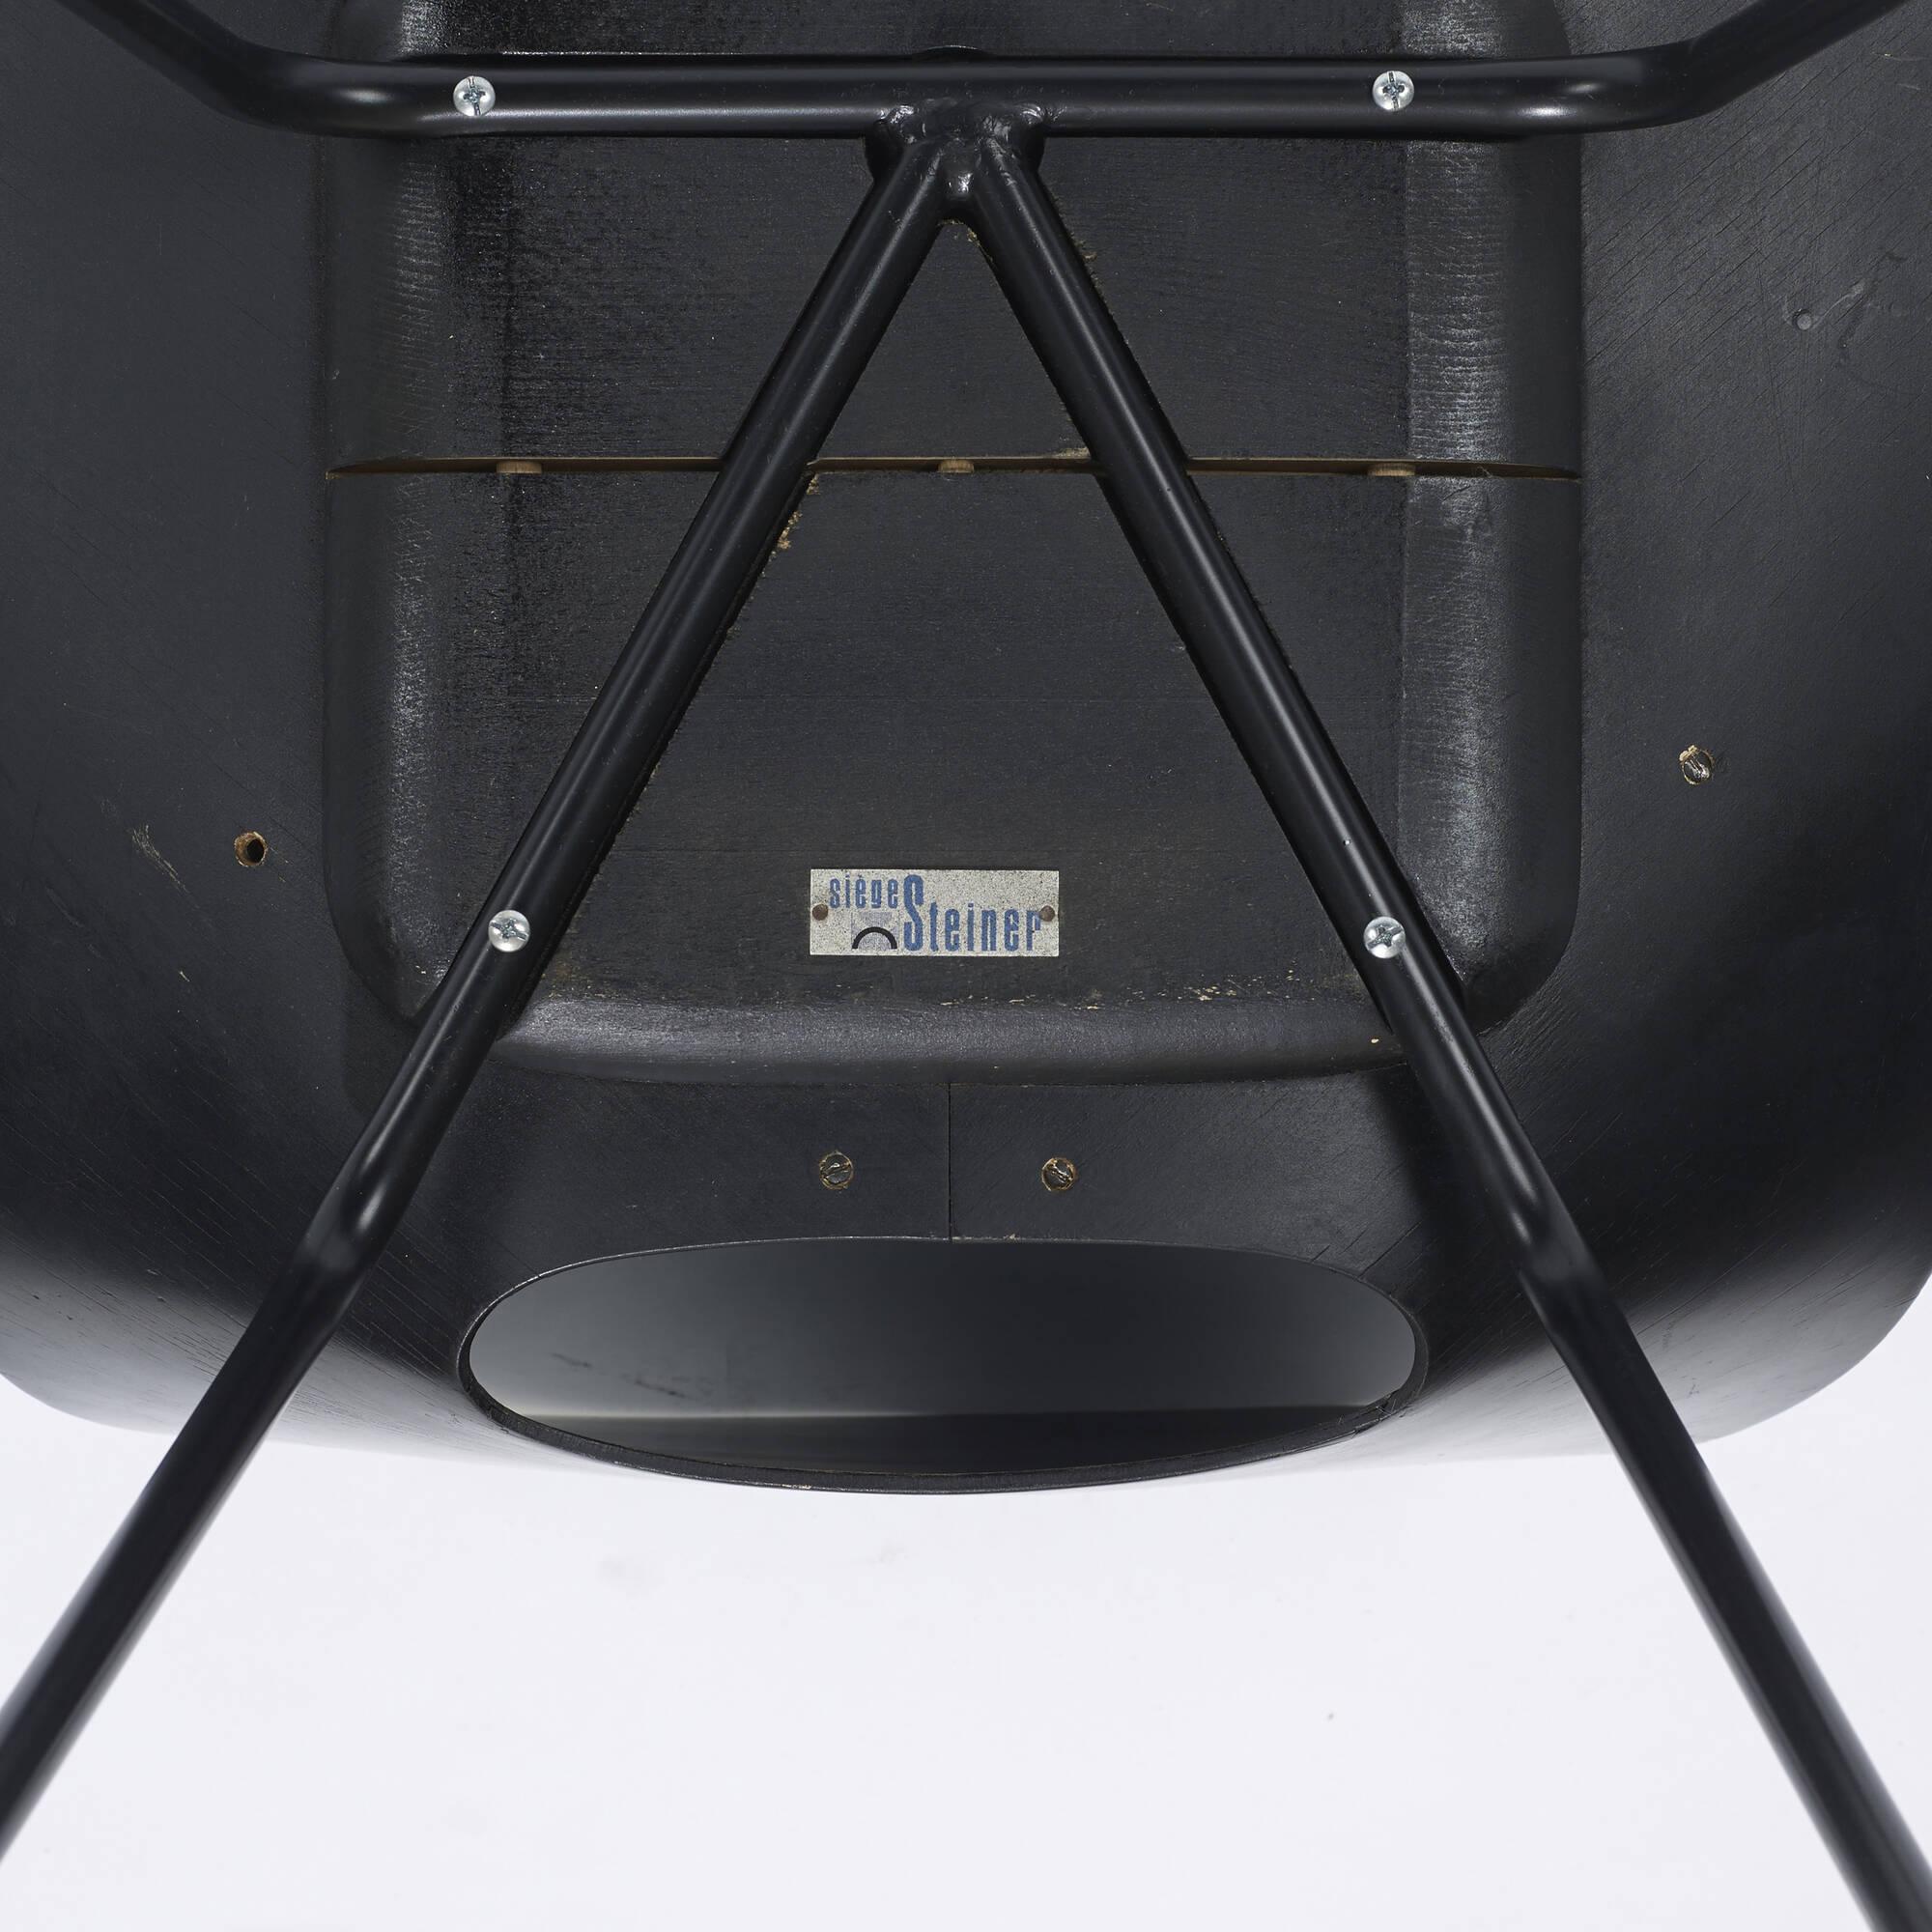 314: Pierre Guariche / Tonneau chairs, set of six (4 of 4)